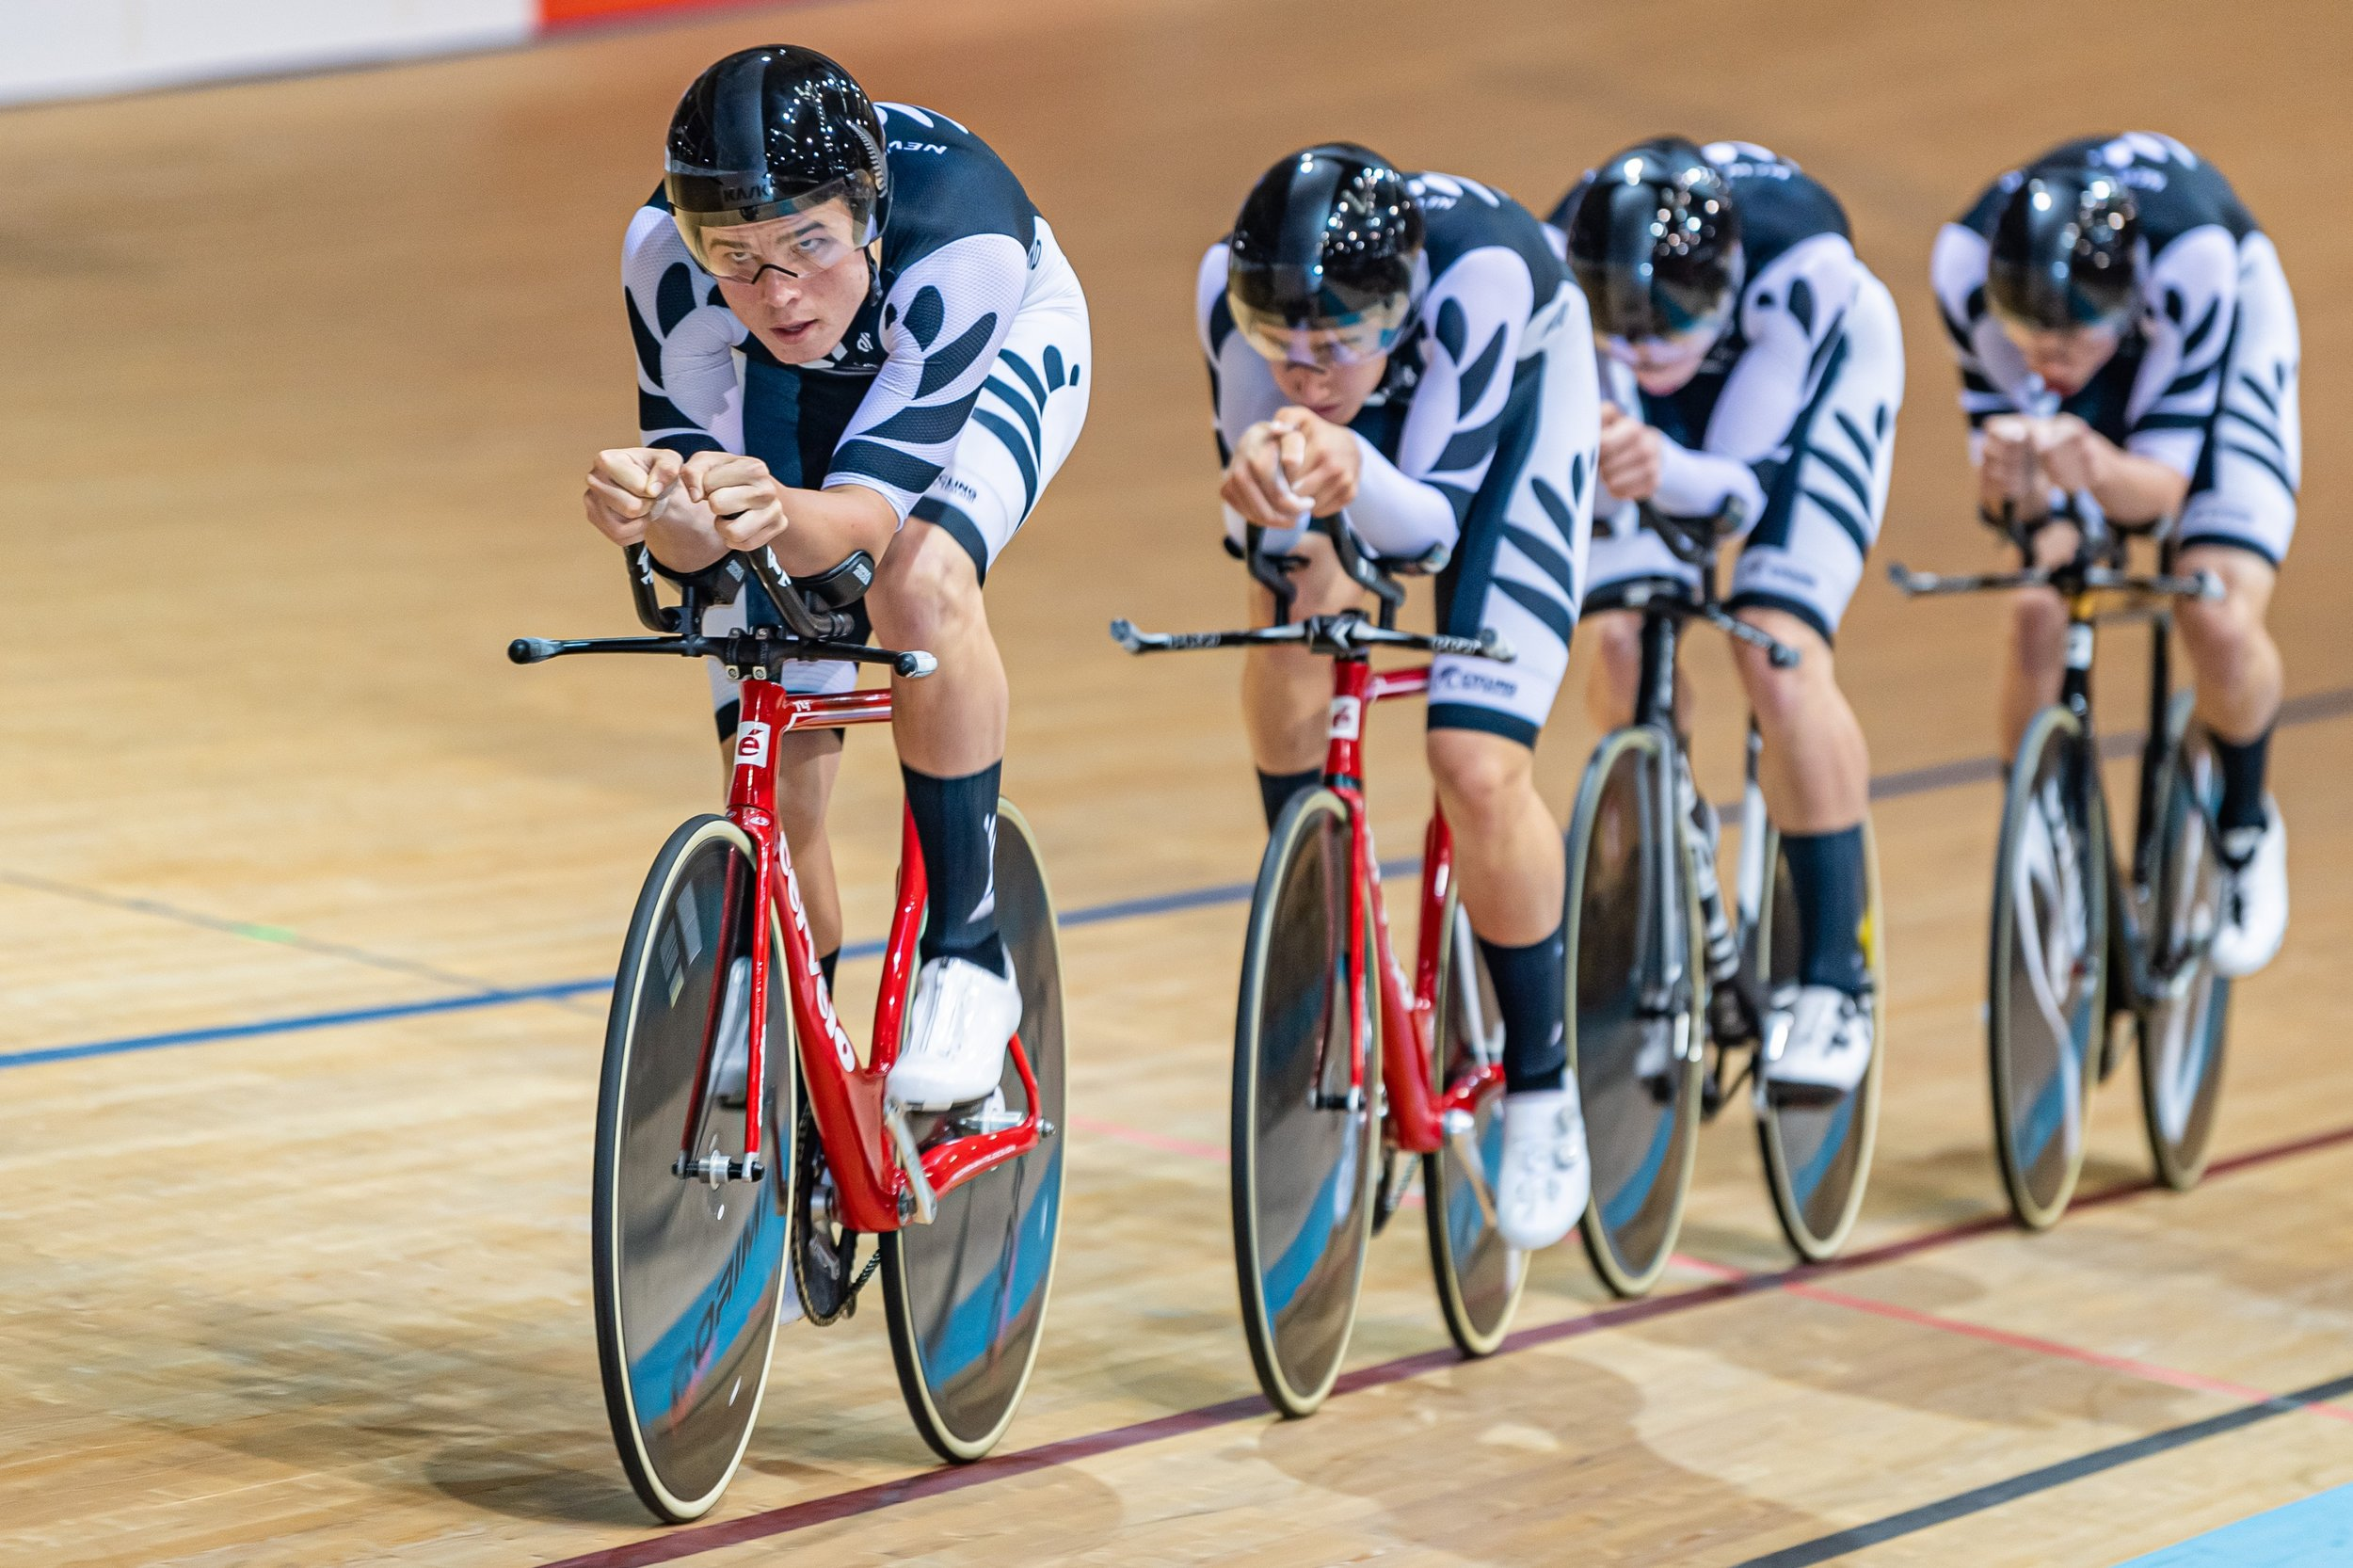 Photo: Lachie Dickson leads the New Zealand men's team pursuit. Pic: Guy Swarbrick